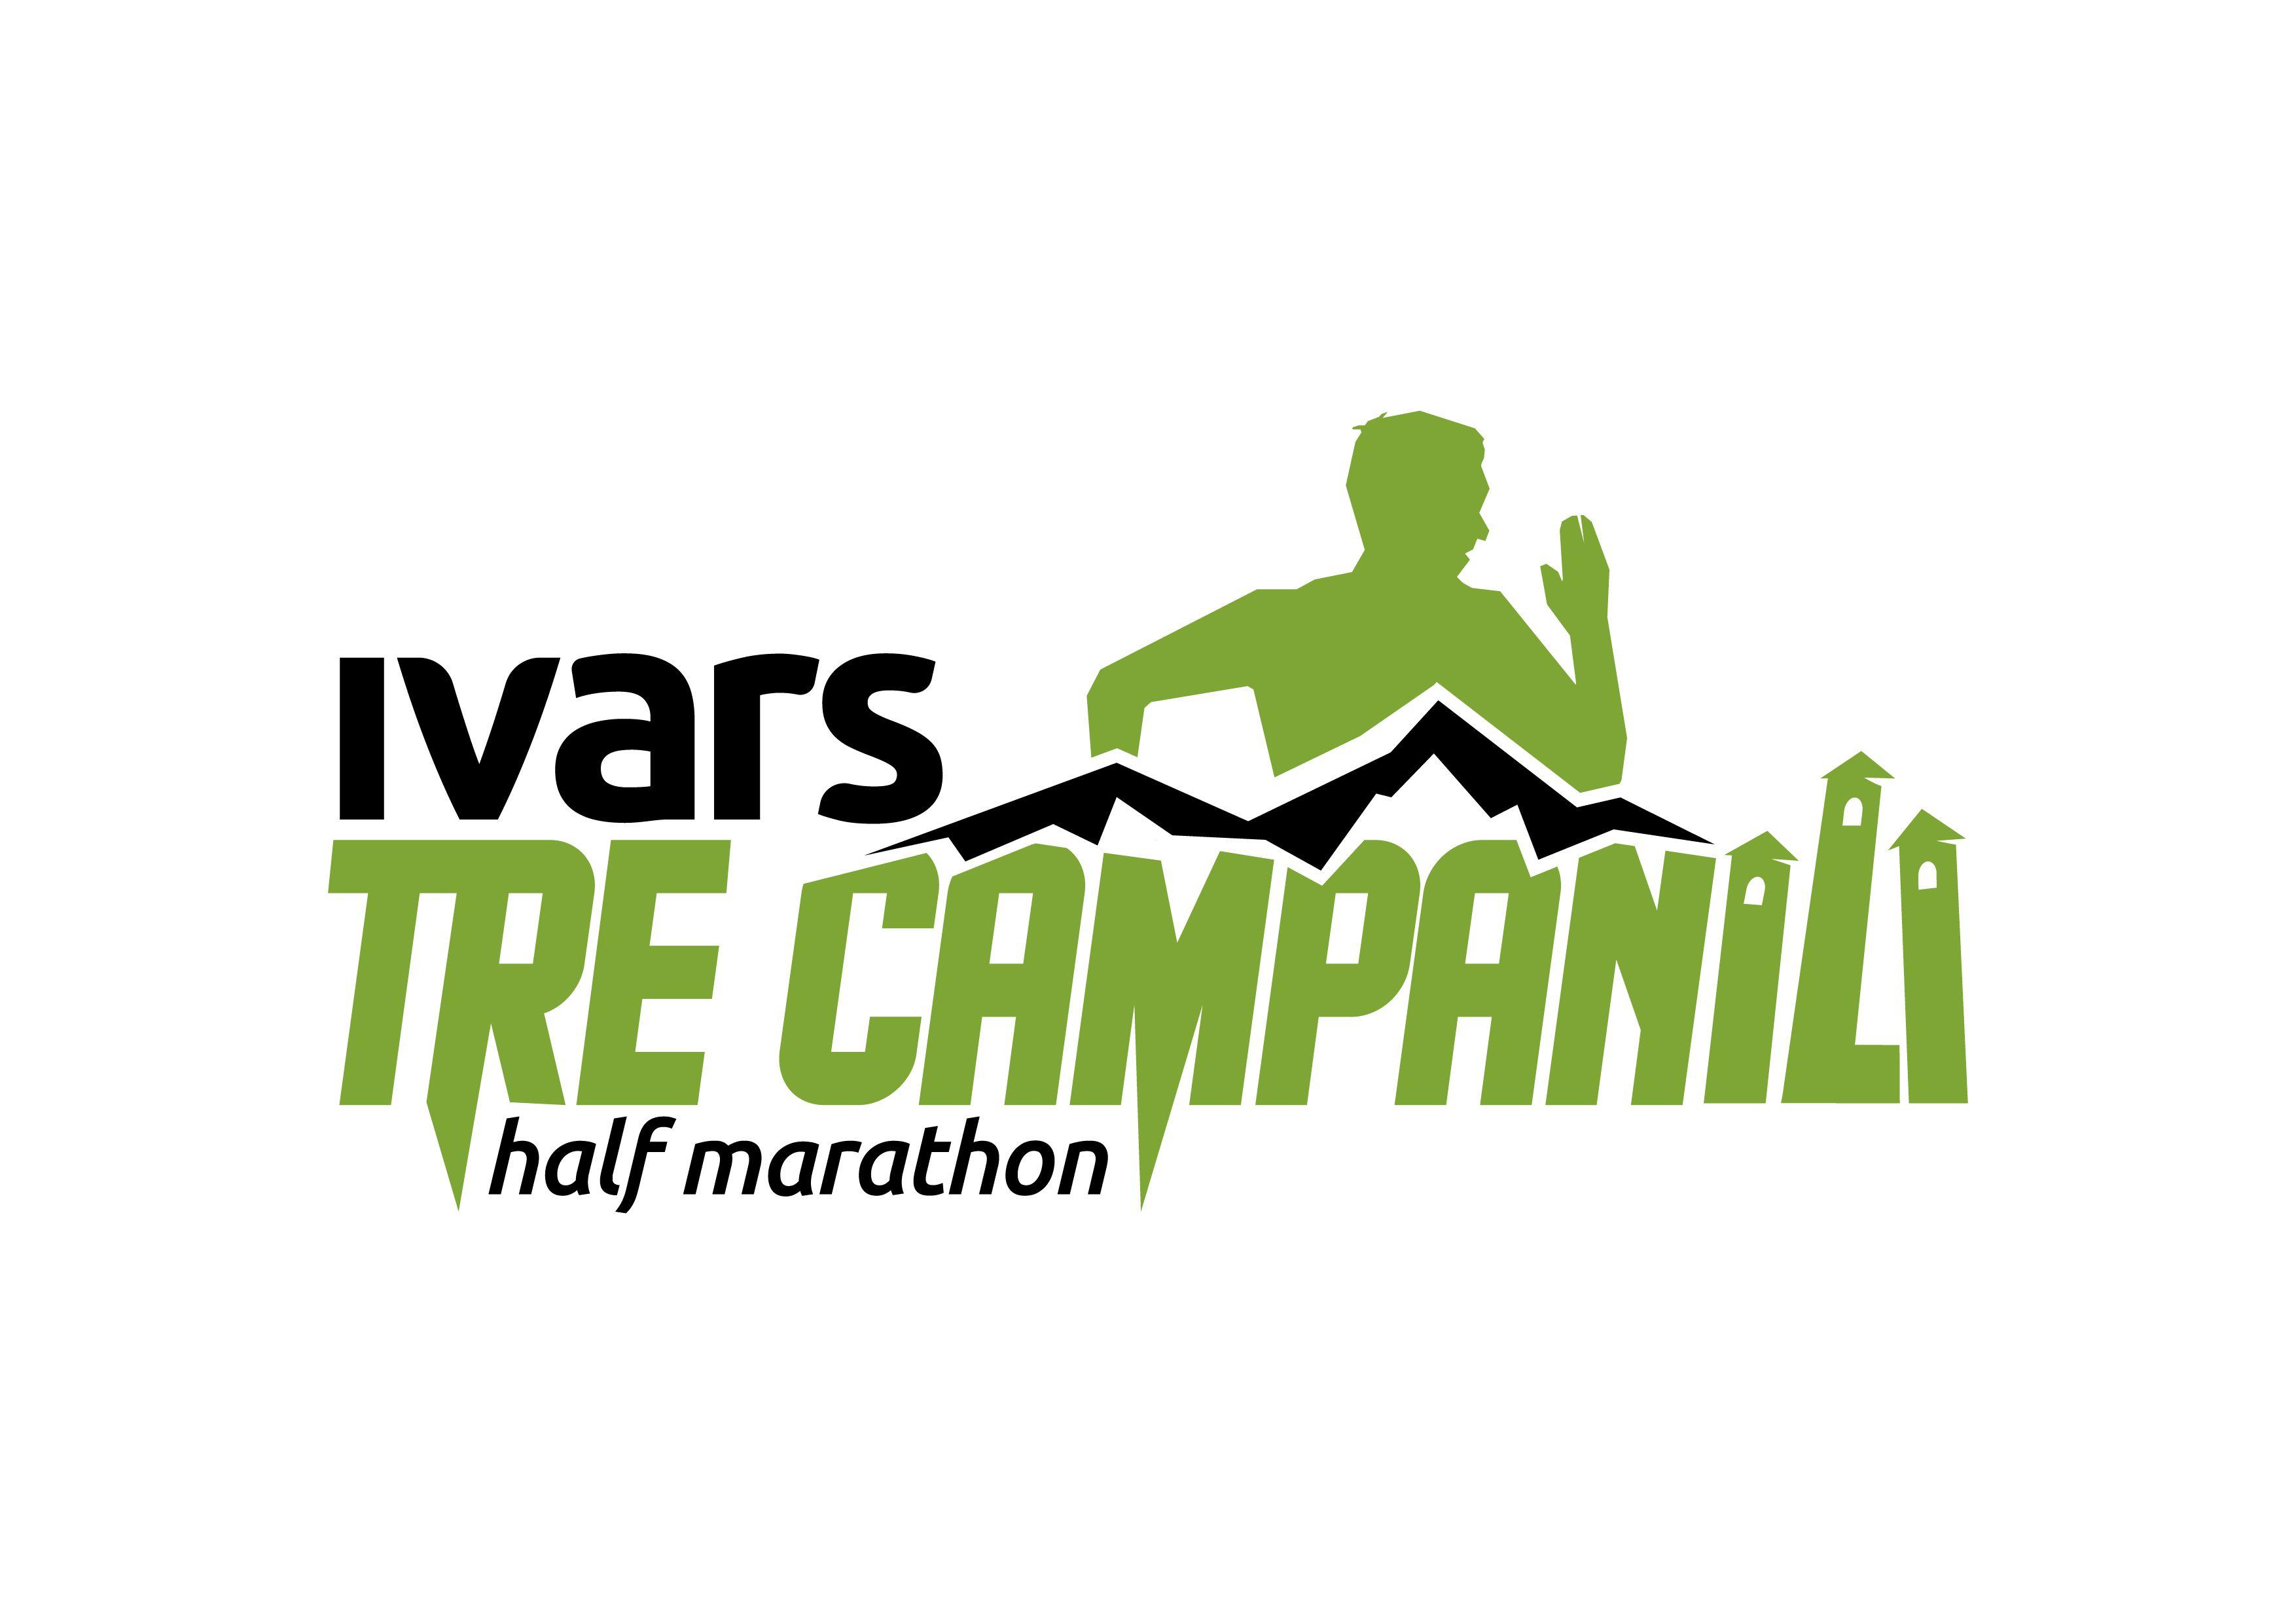 ivars-tre-campanili-half-marathon-gets-a-makeover